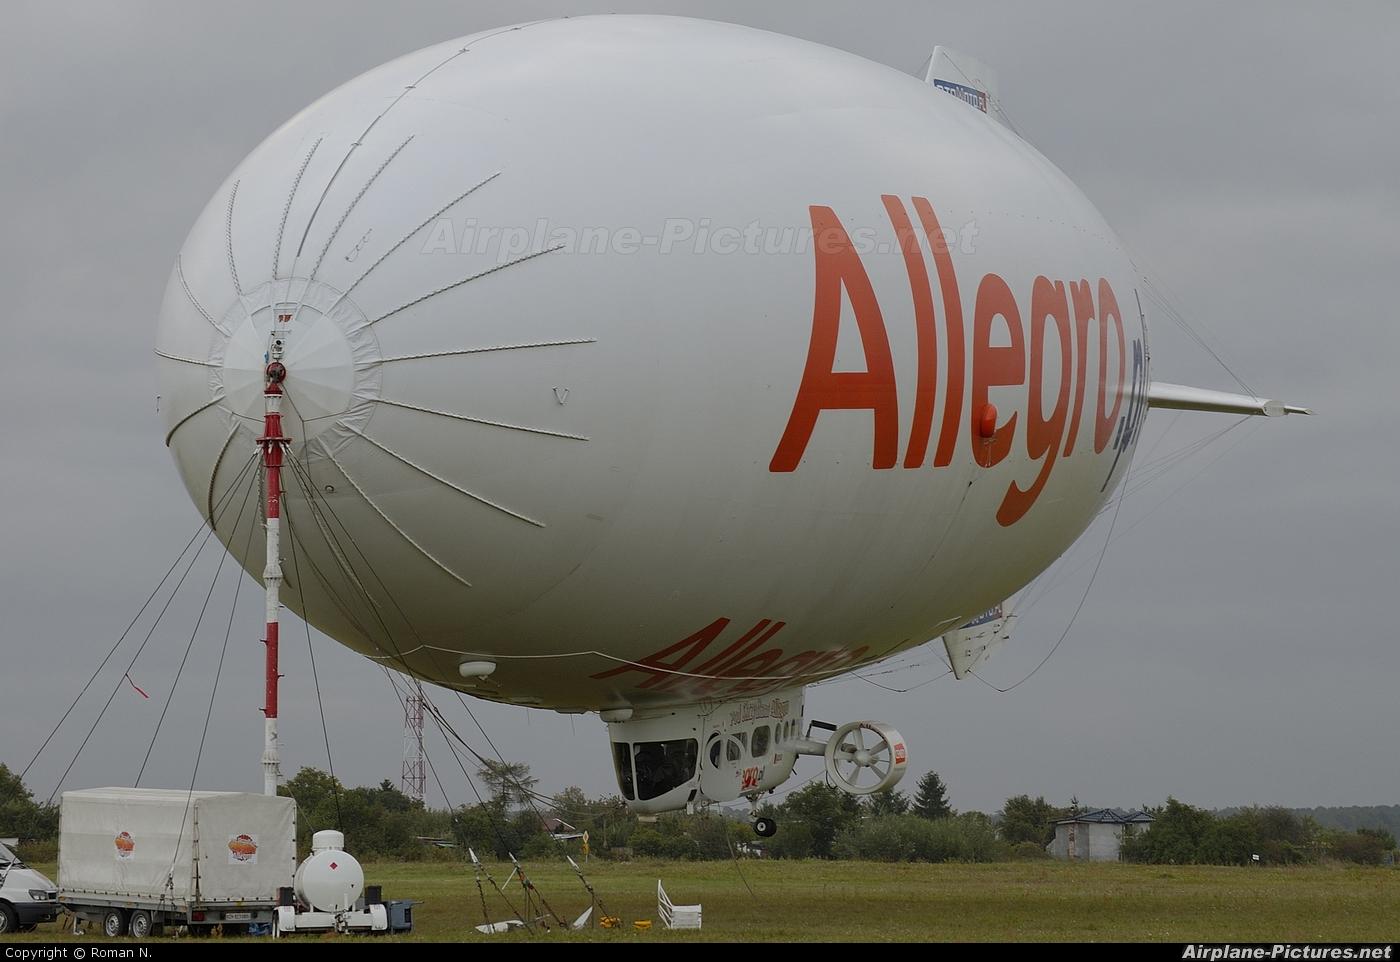 Allegro.pl - aircraft at Bydgoszcz - Szwederowo